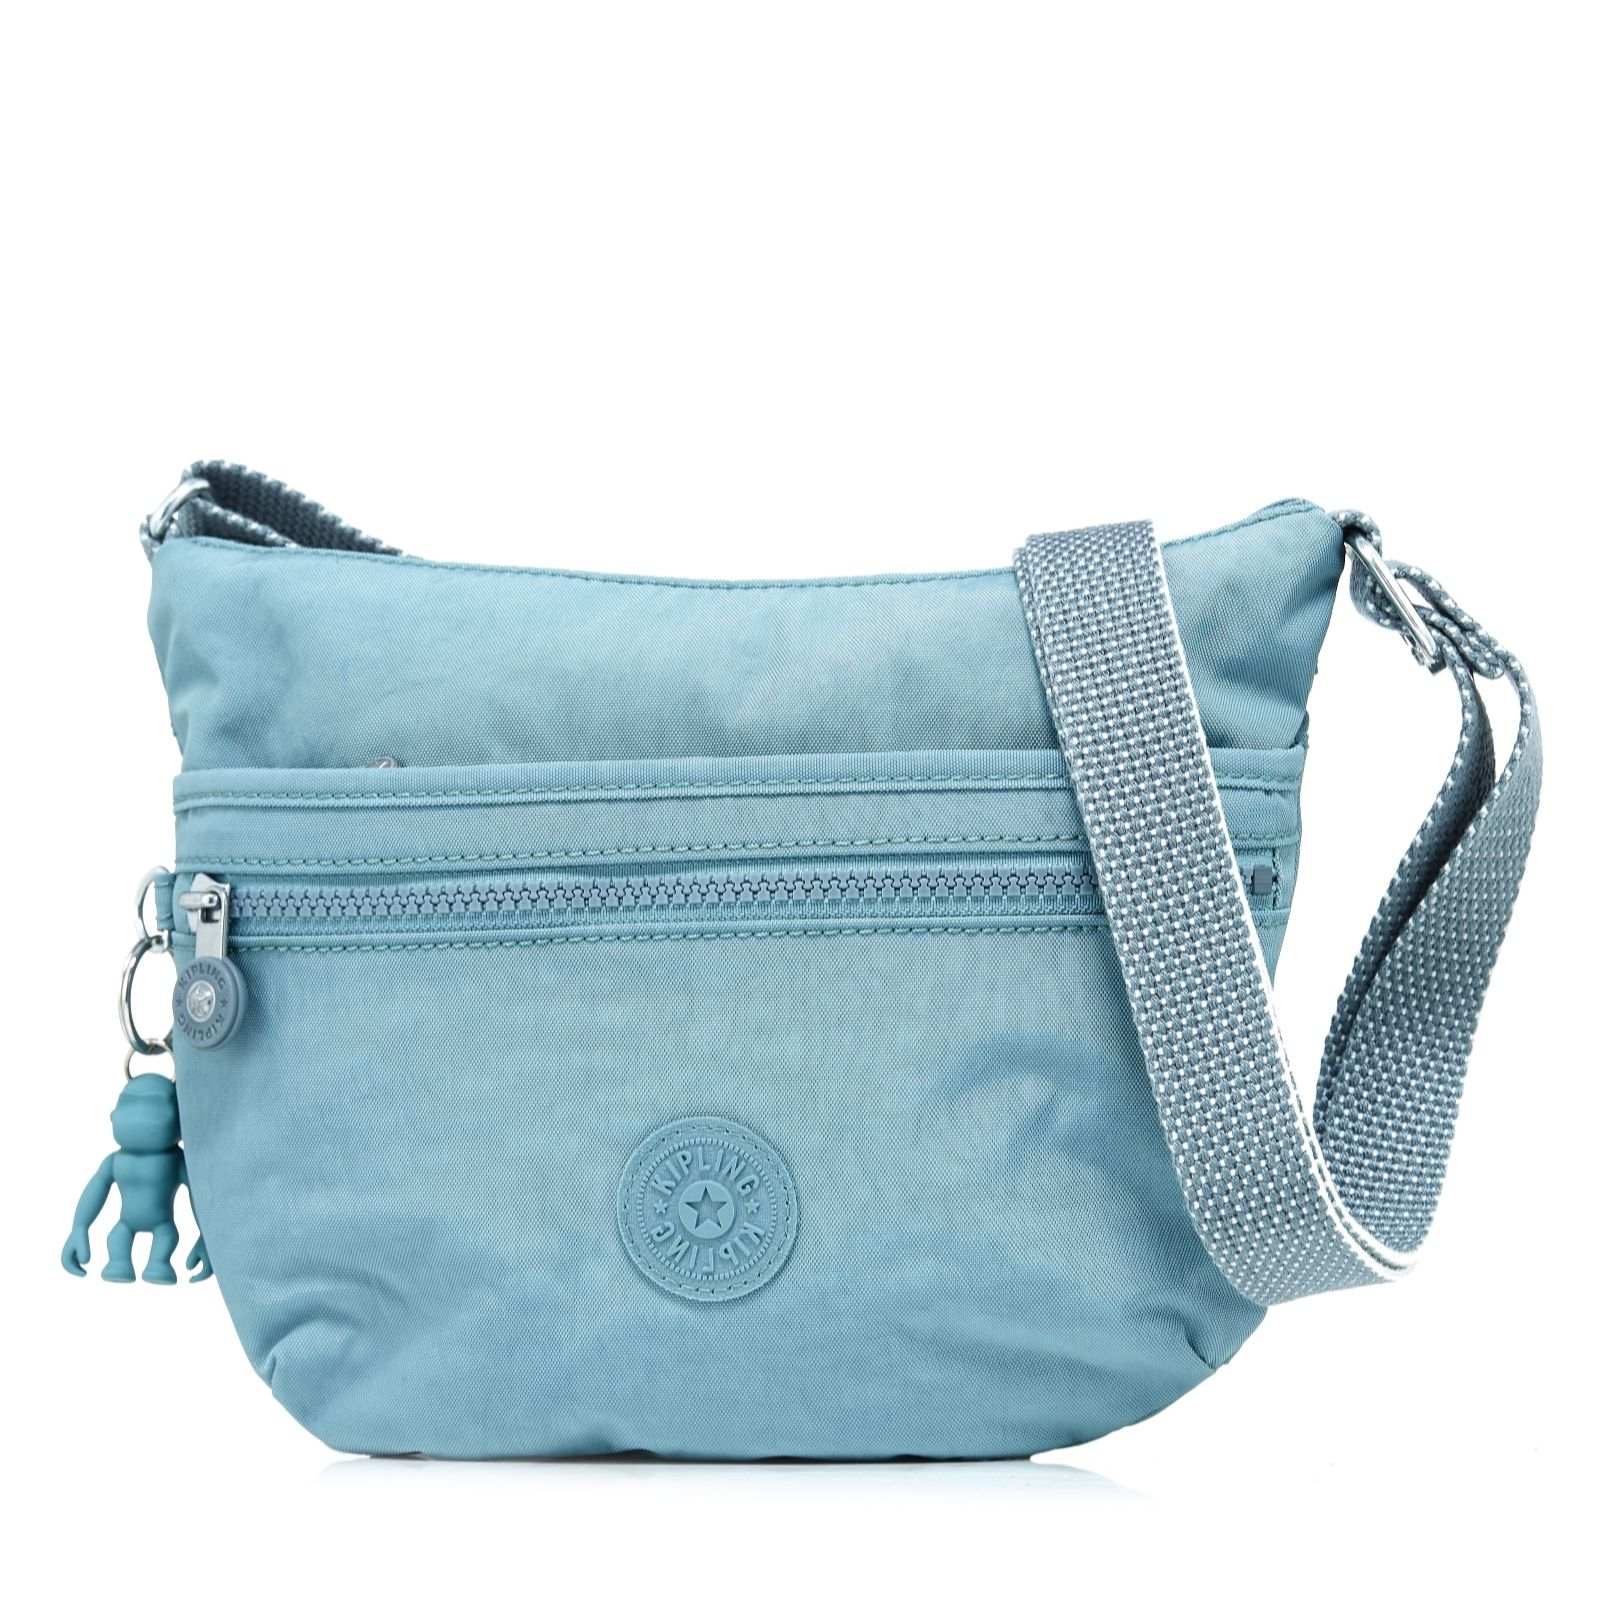 Kipling Arto Basic Small Crossbody Bag